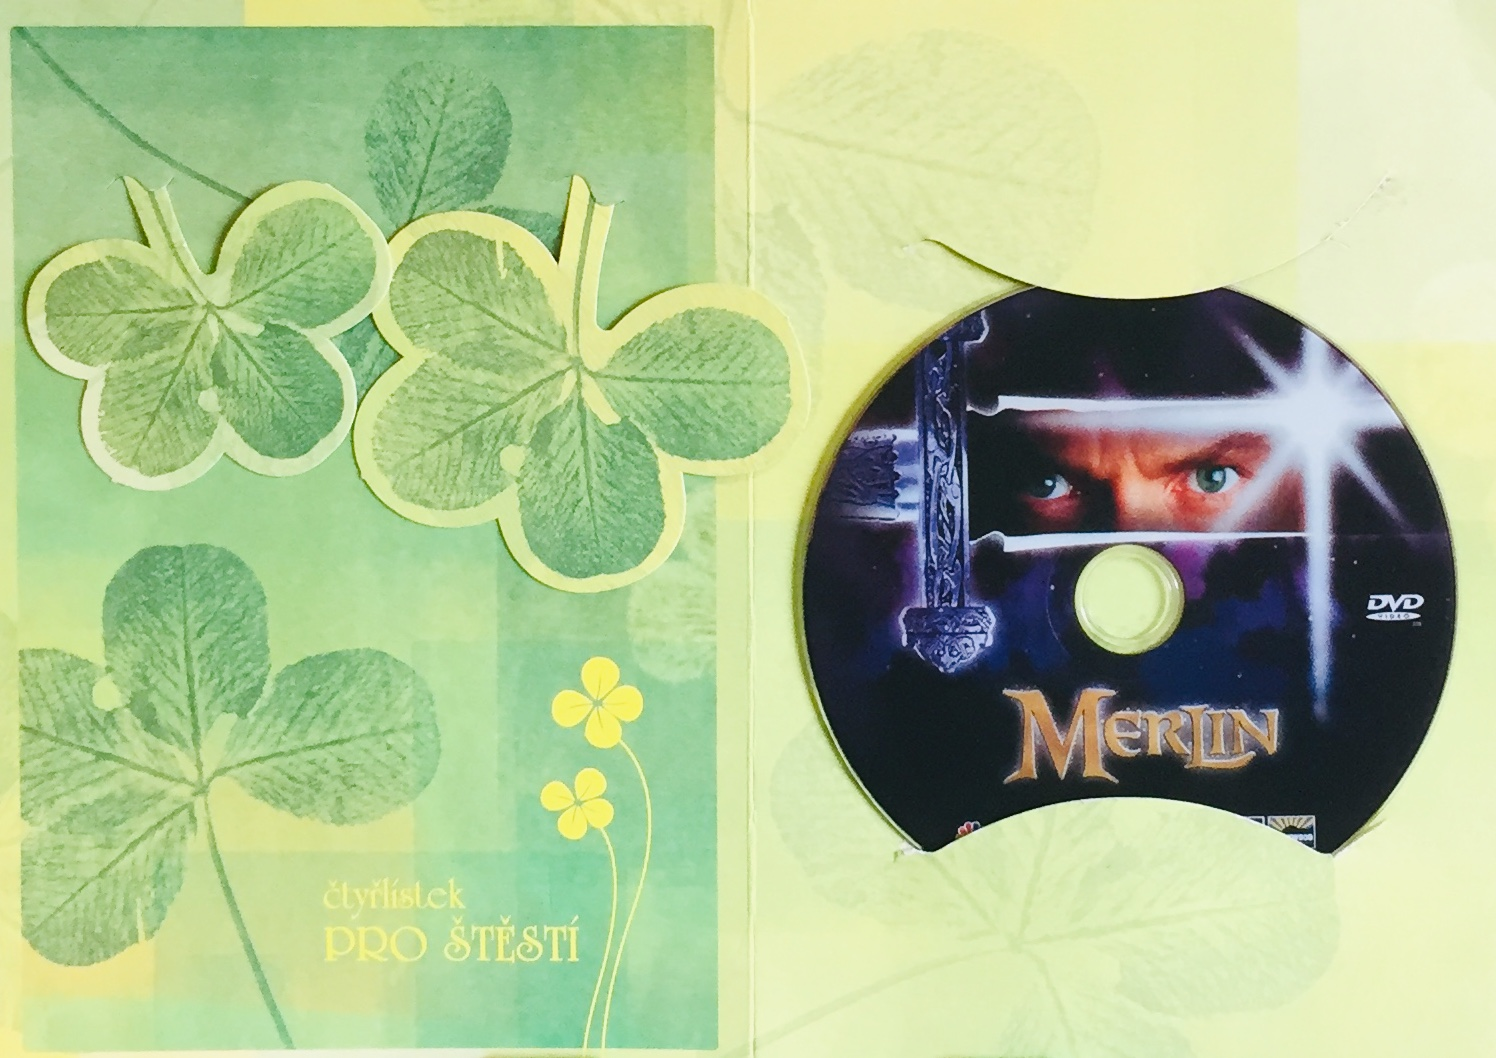 Merlin - DVD /dárkový obal/